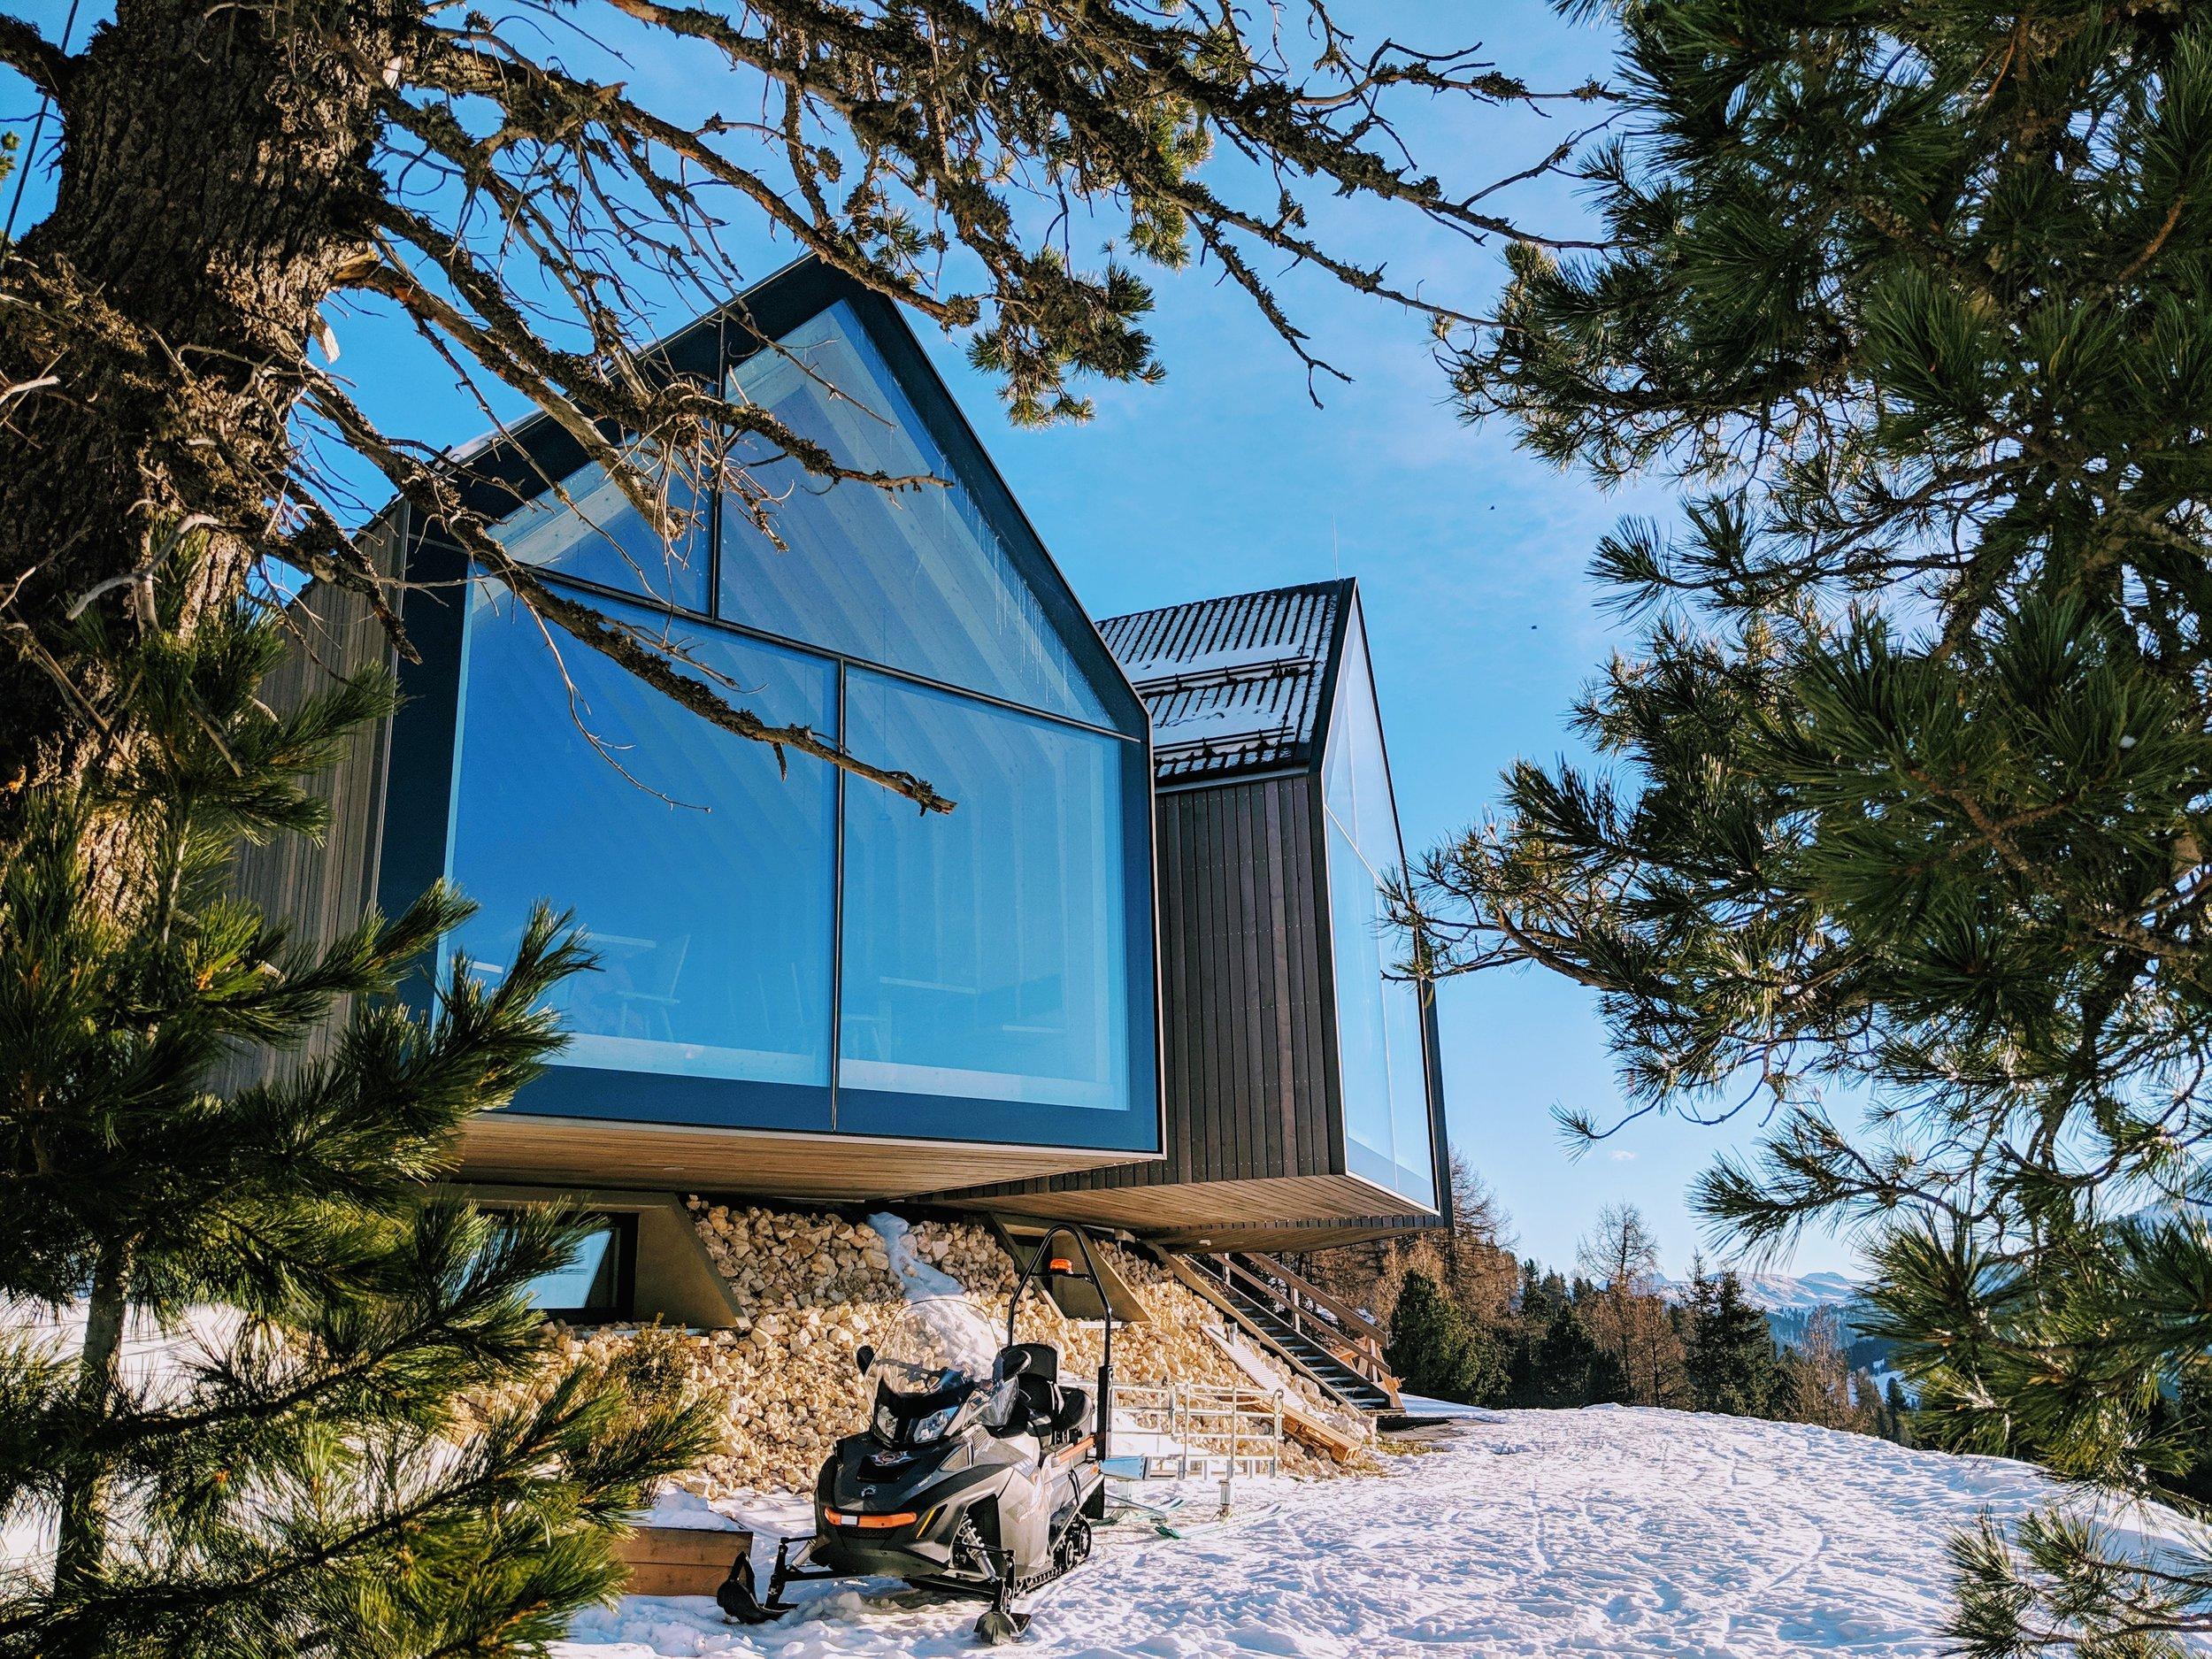 Oberholz hut